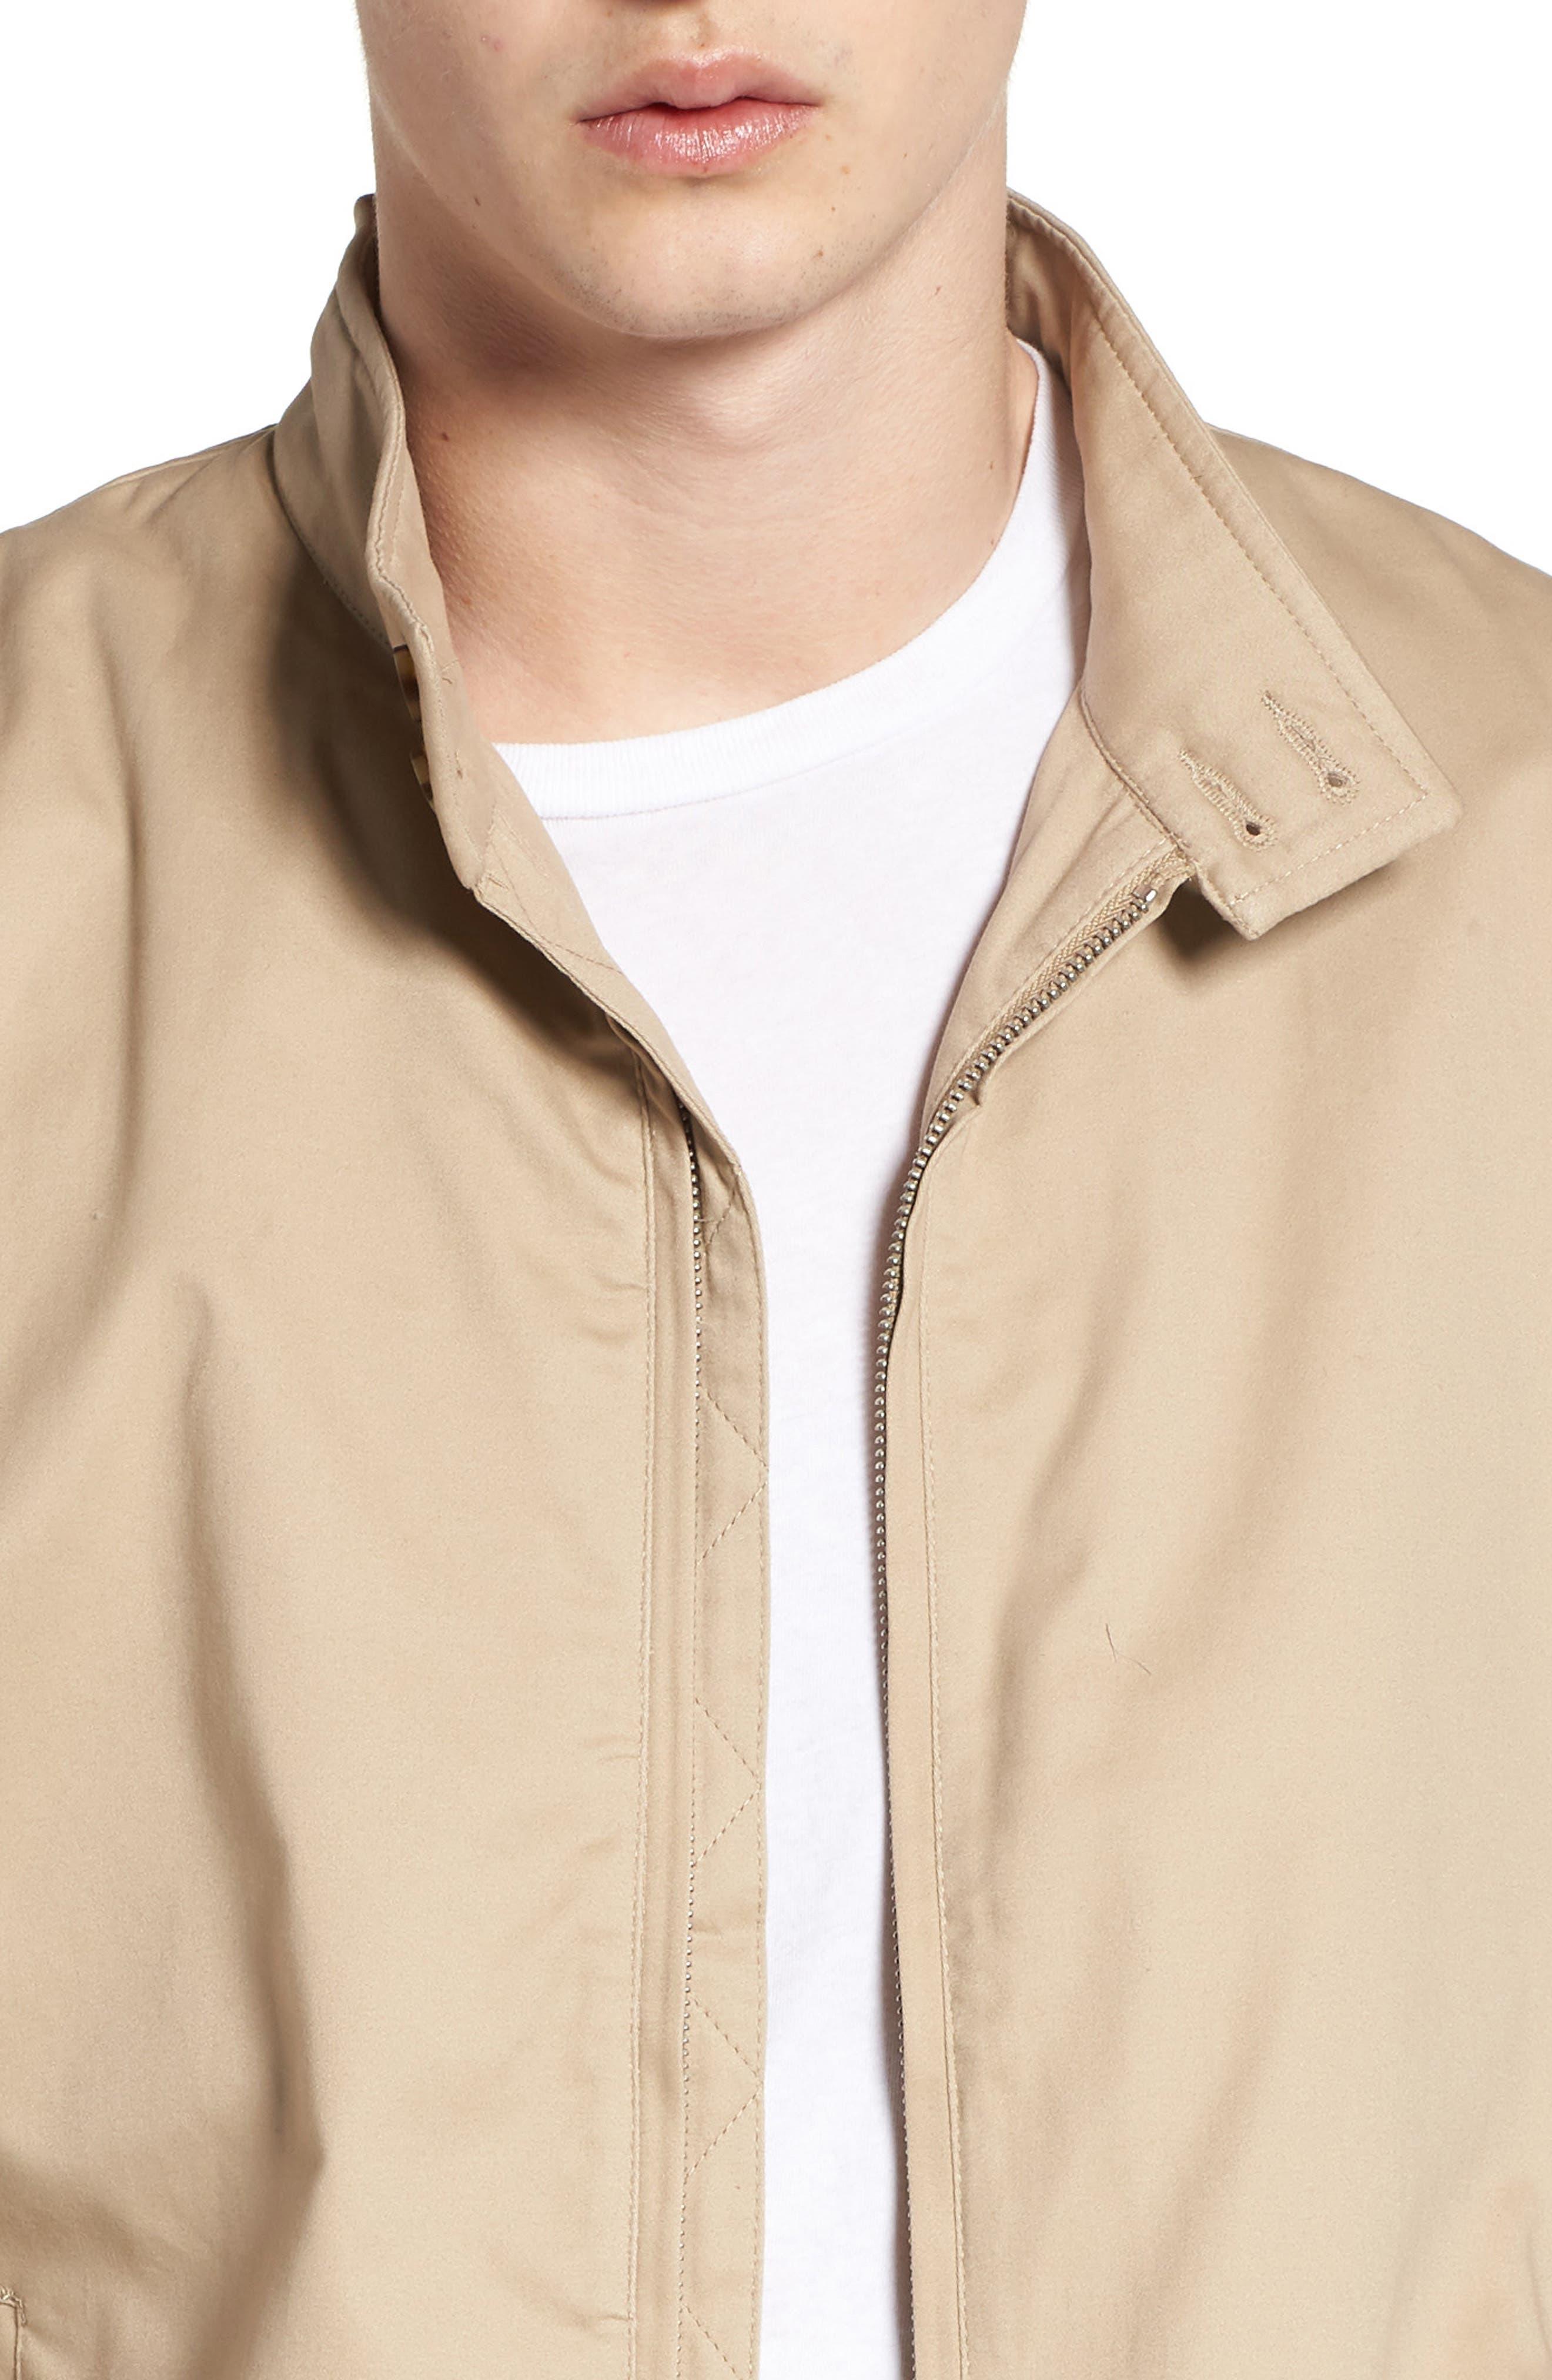 Harrington Jacket,                             Alternate thumbnail 4, color,                             Stone